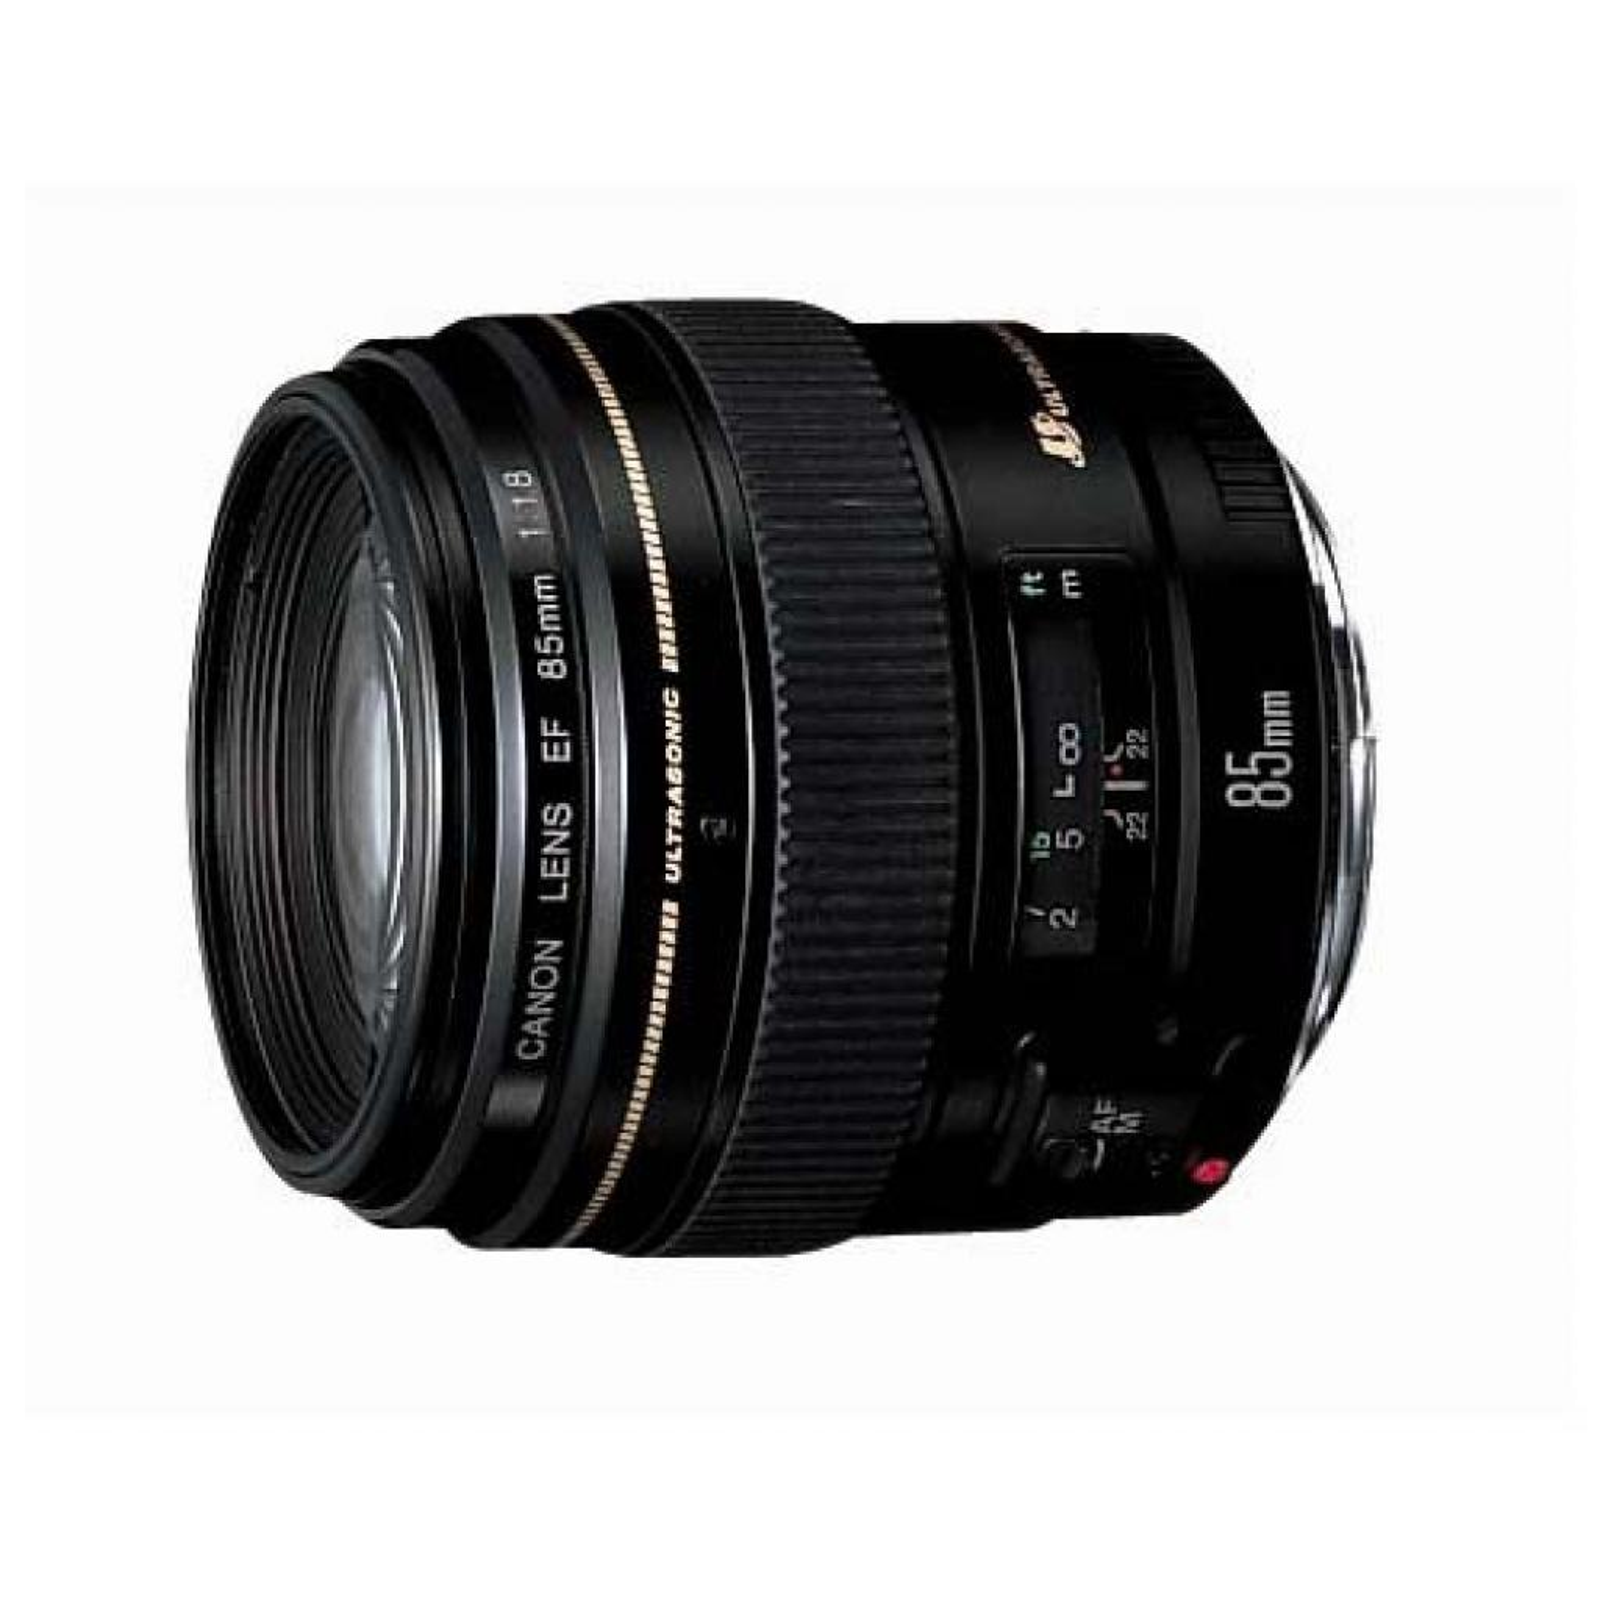 Объектив EF 85mm f/1.8 USM Canon (2519A012)